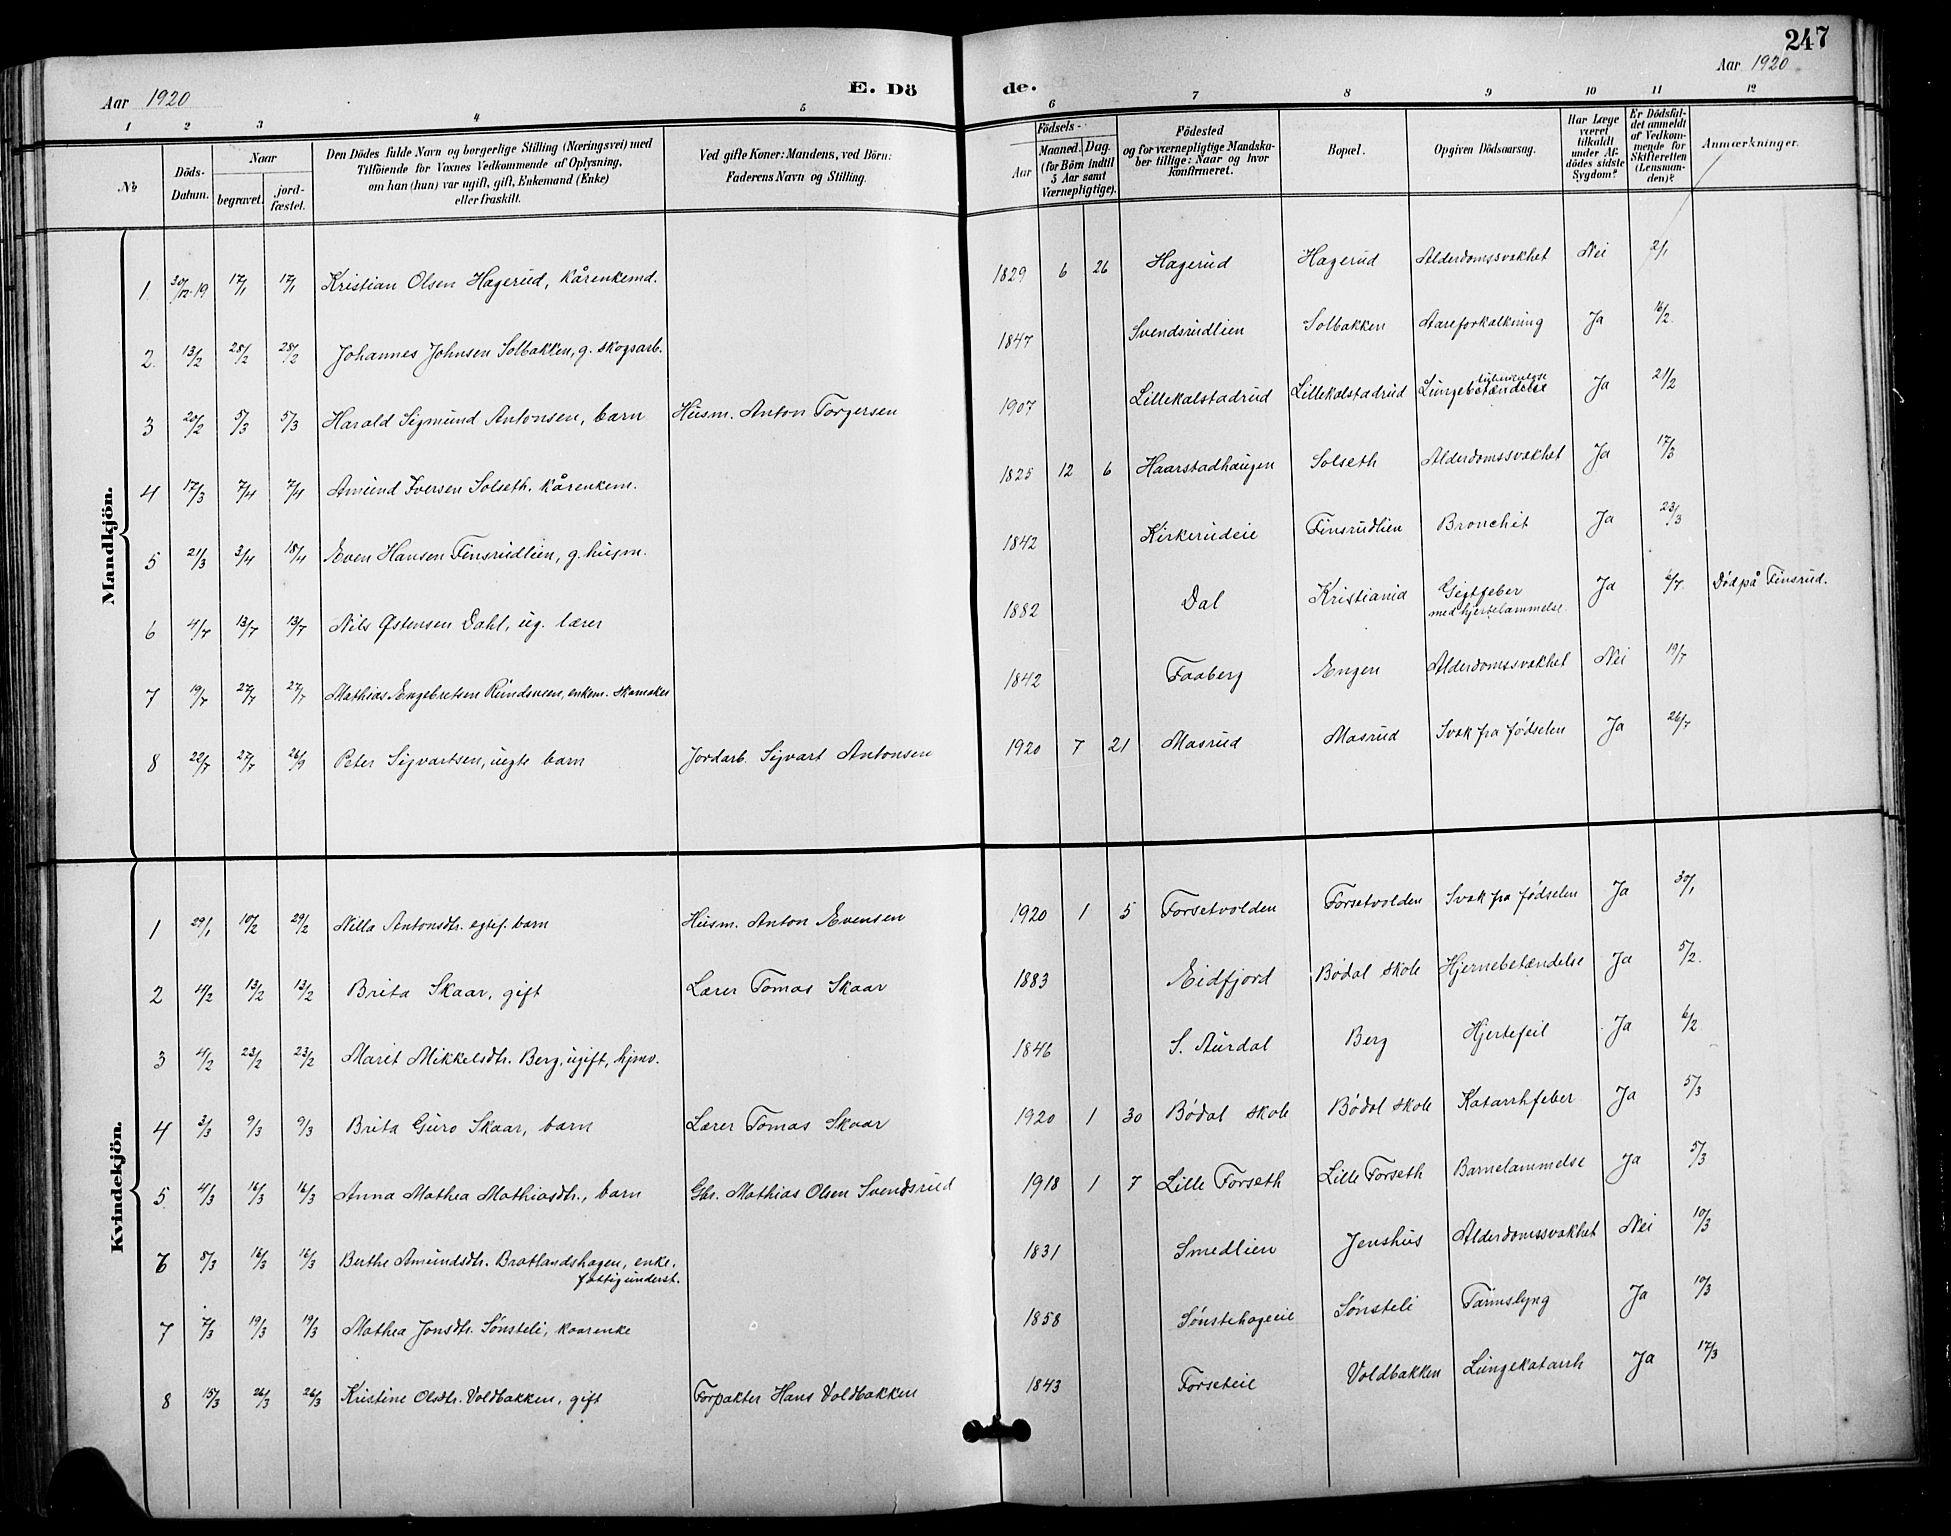 SAH, Vestre Gausdal prestekontor, Klokkerbok nr. 3, 1896-1925, s. 247